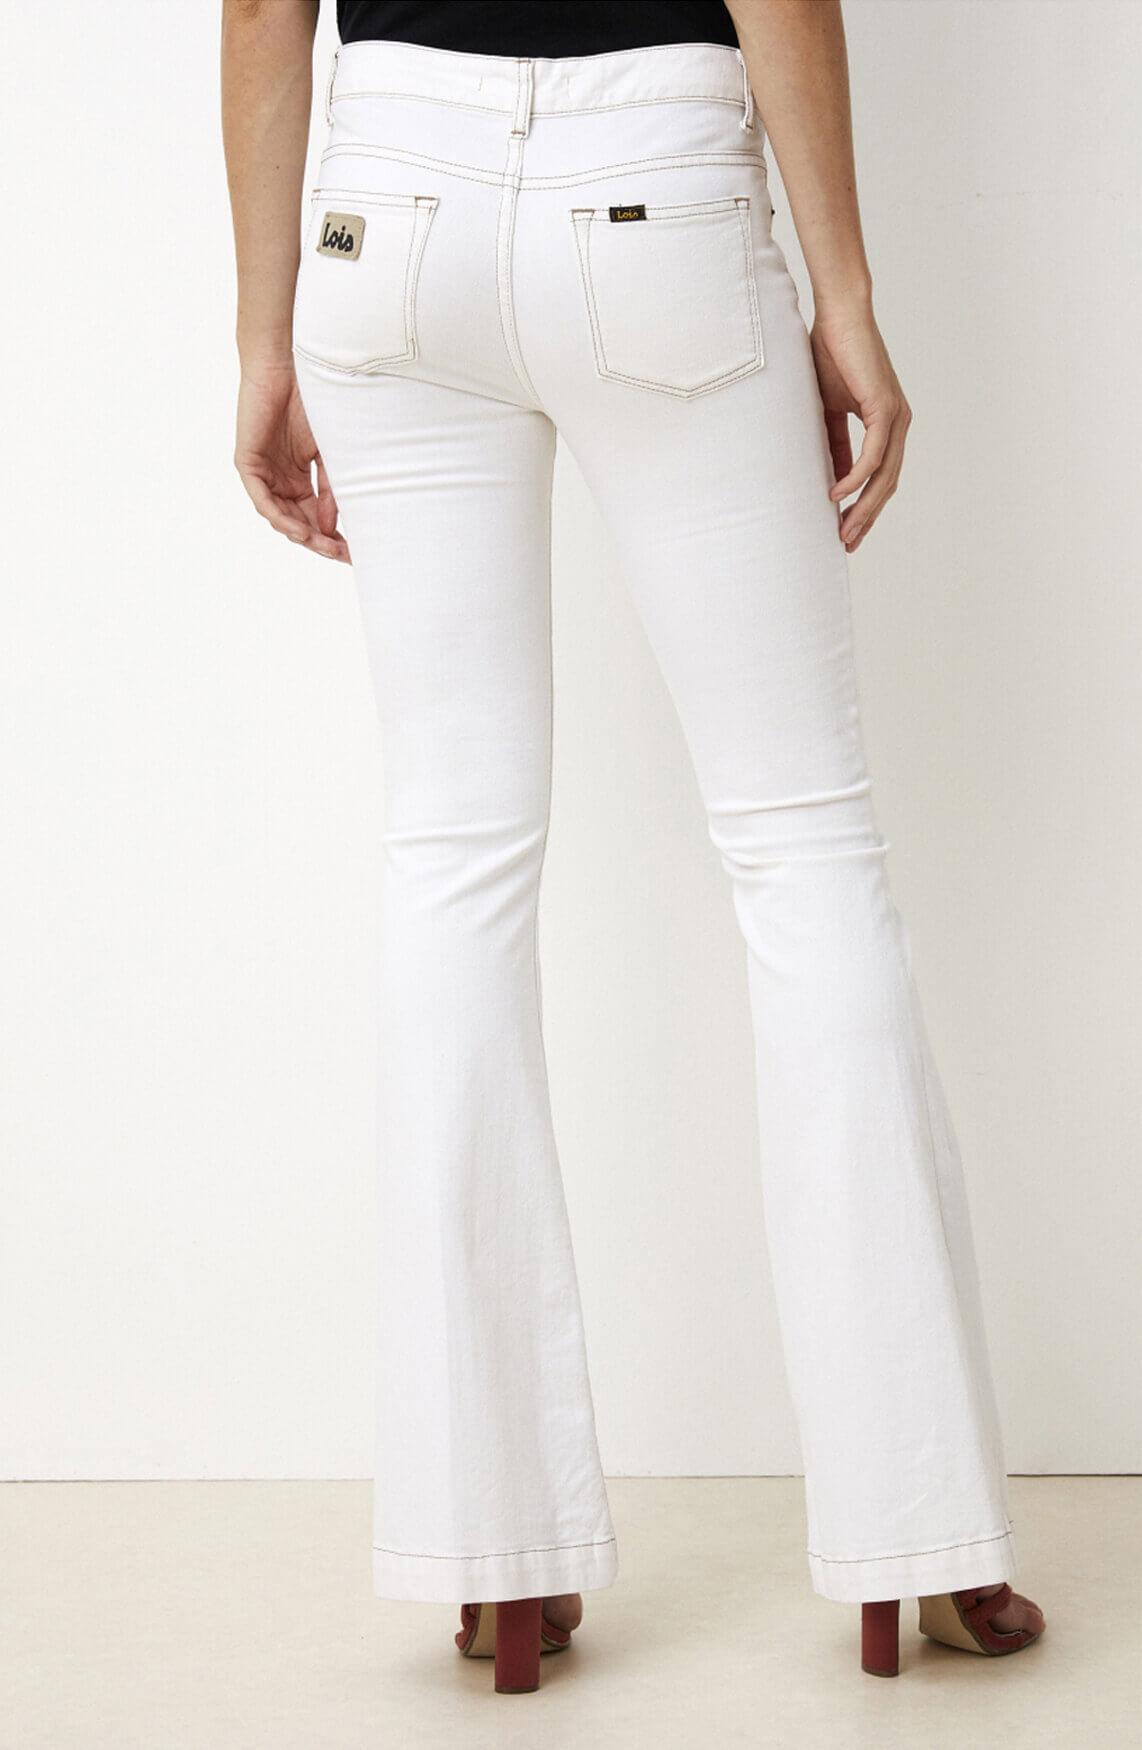 Lois Dames Cheers Chic jeans L34 Ecru